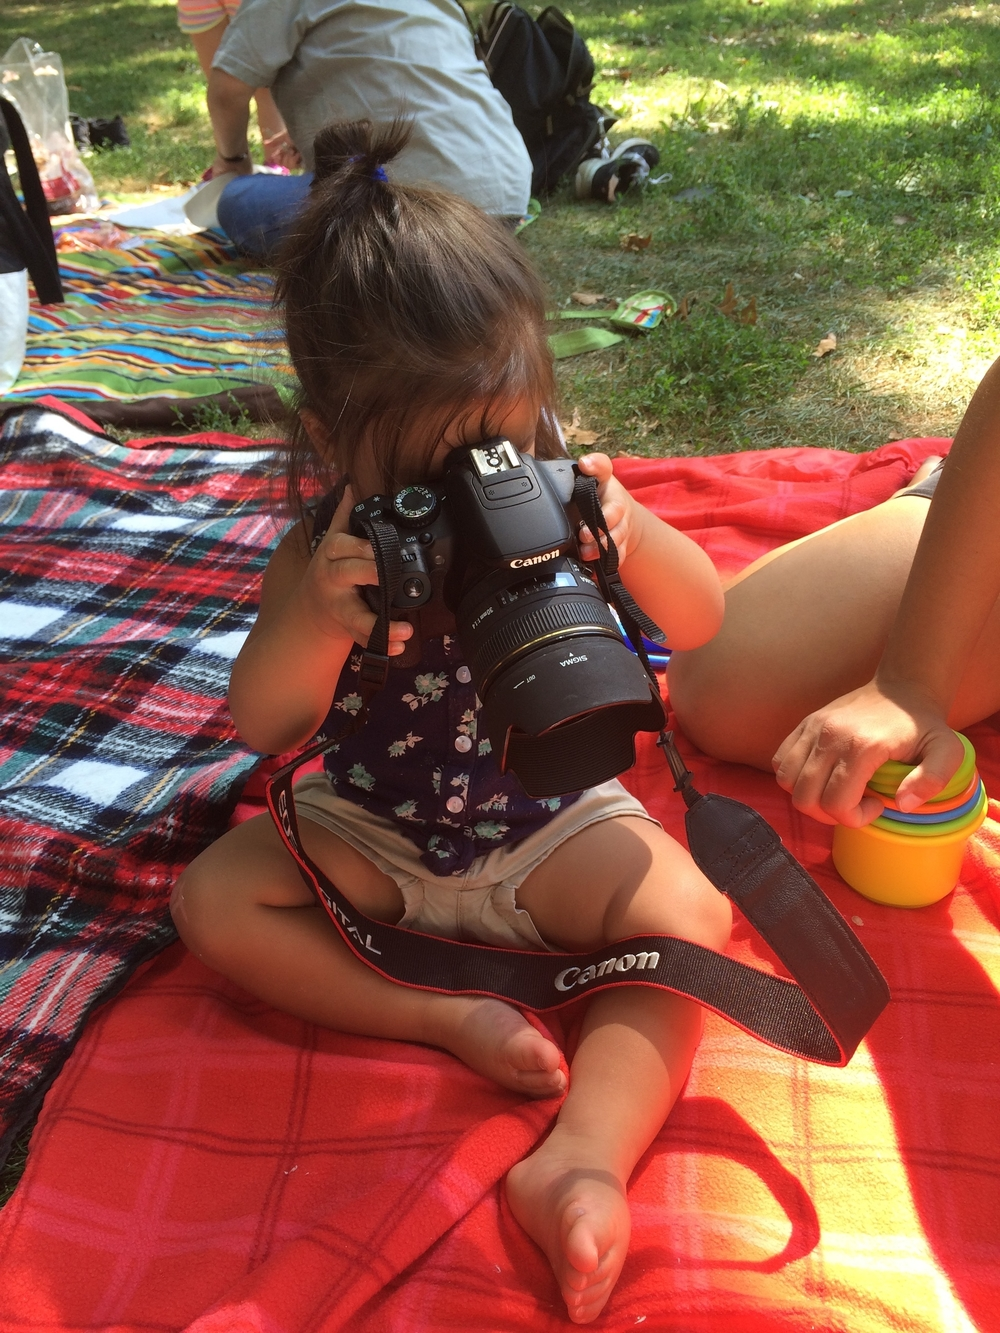 Future photgrapher